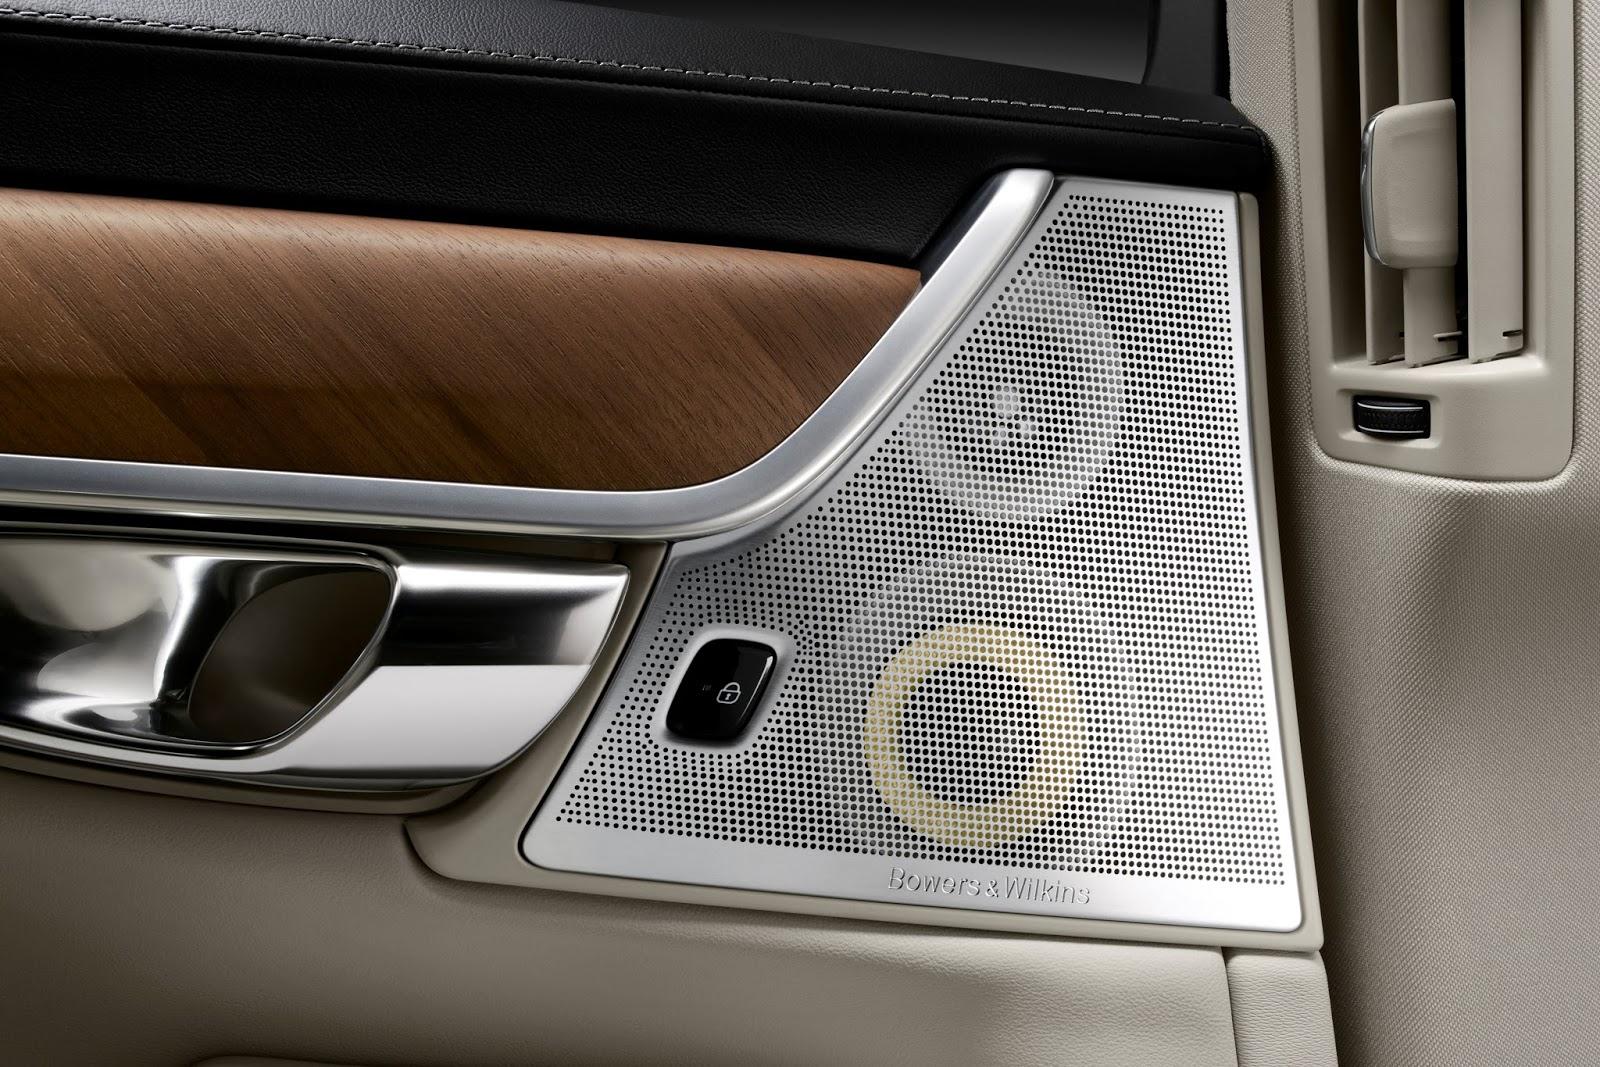 170135 Interior Bowers and Wilkins Rear Door Speakers Volvo S90 1 Το νέο Volvo S90 έρχεται και βάζει φωτιά στον ανταγωνισμό premium sedan, Volvo, Volvo Cars, Volvo S90